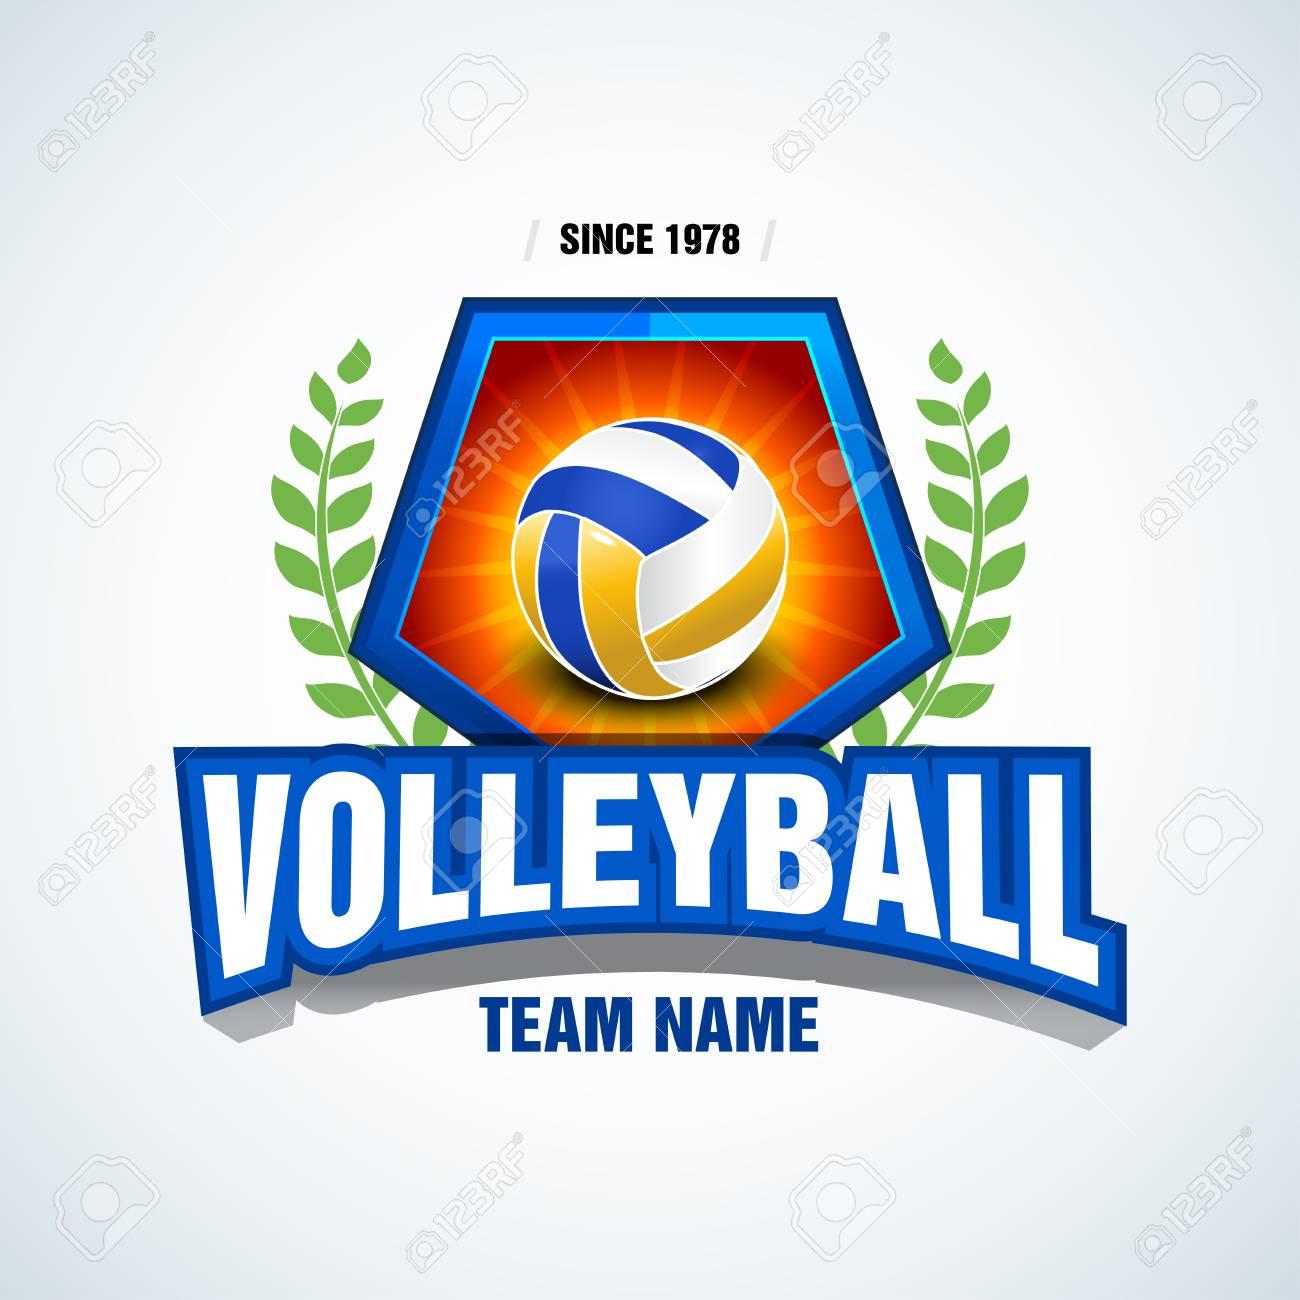 38c32c0c Volleyball team logo template. Volleyball emblem, logotype template, t-shirt  apparel design